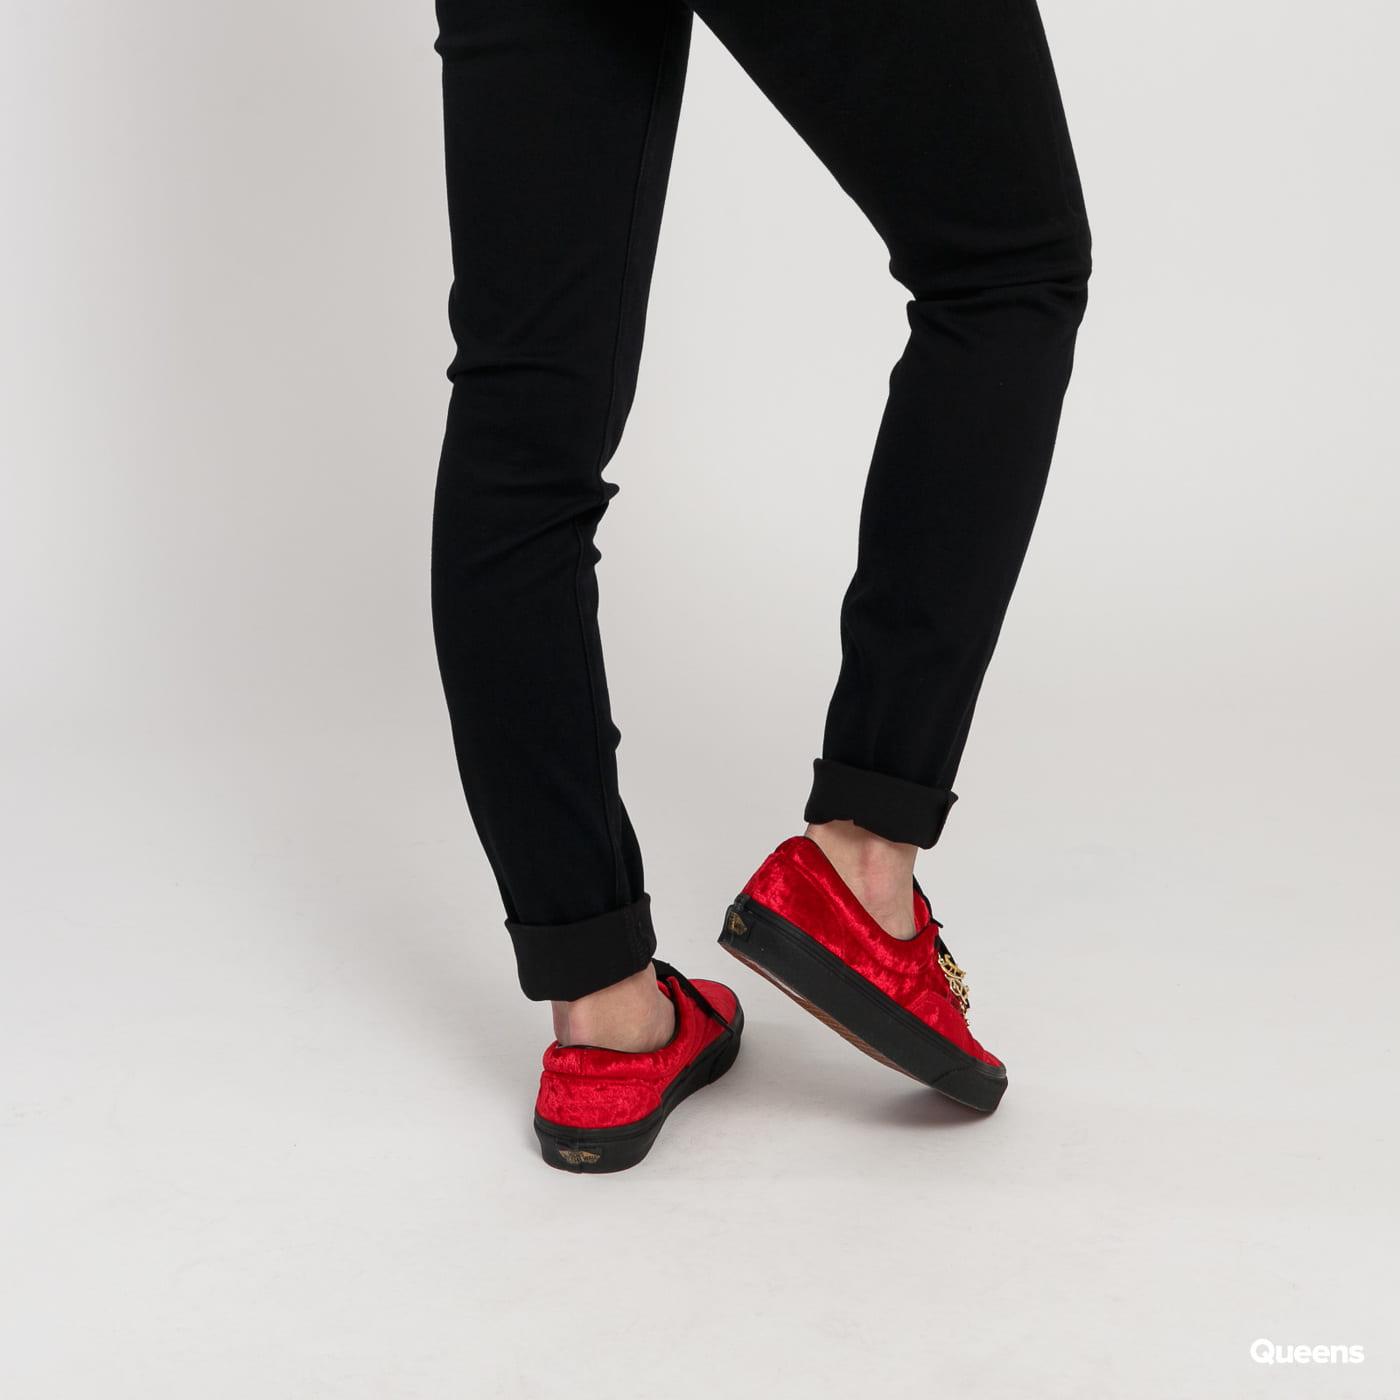 Levi's ® 721 High Rise Skinny Long Shot black / red